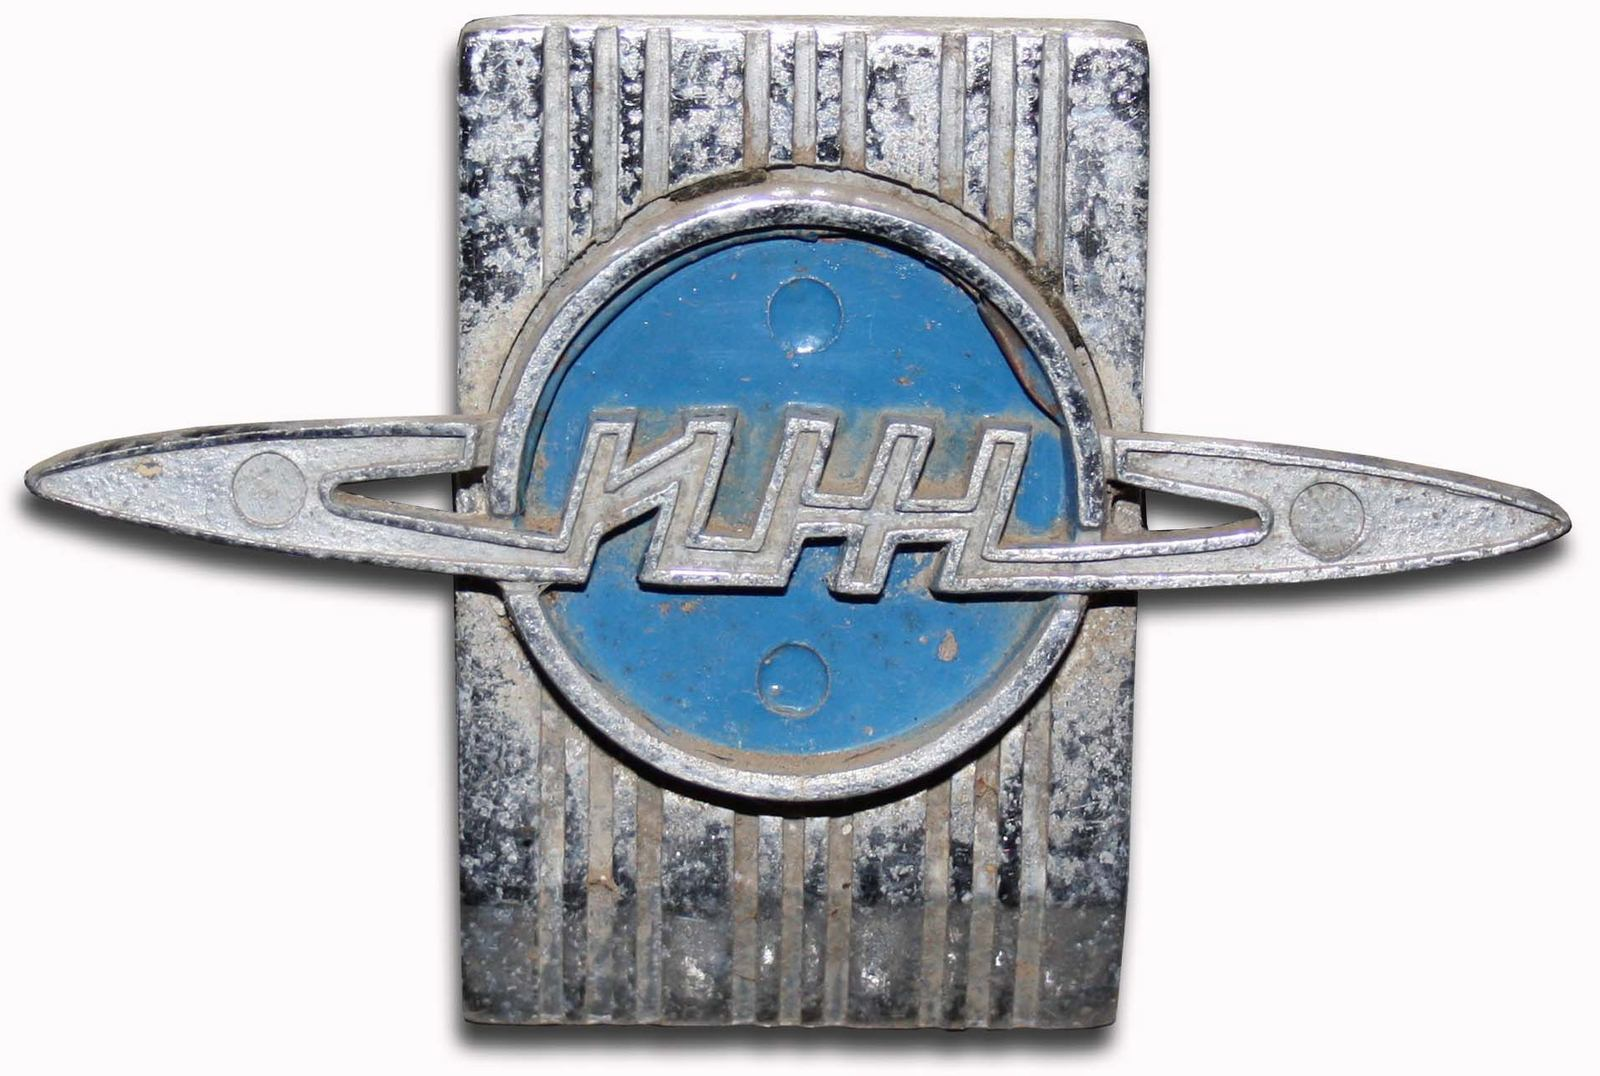 1968. Izh Moskvich-408 (grill emblem)